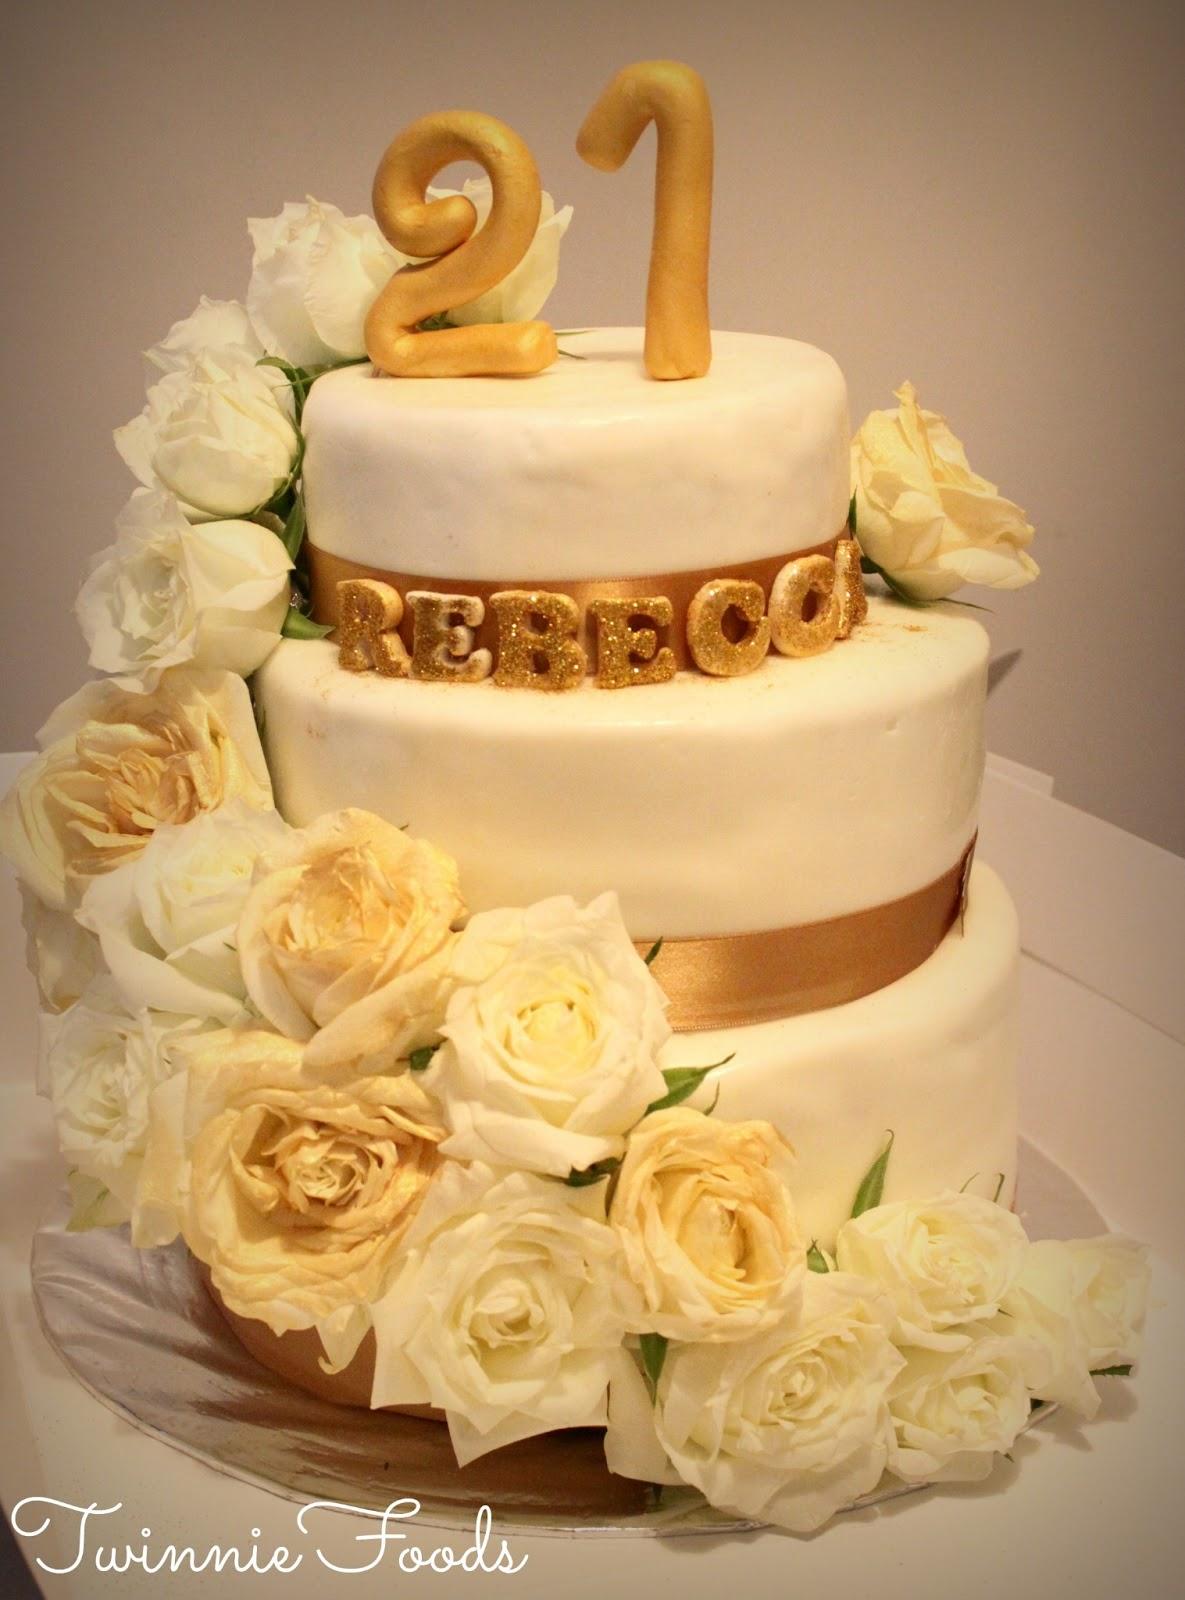 Floral White Amp Gold 21st Birthday Cake Twinniefoods